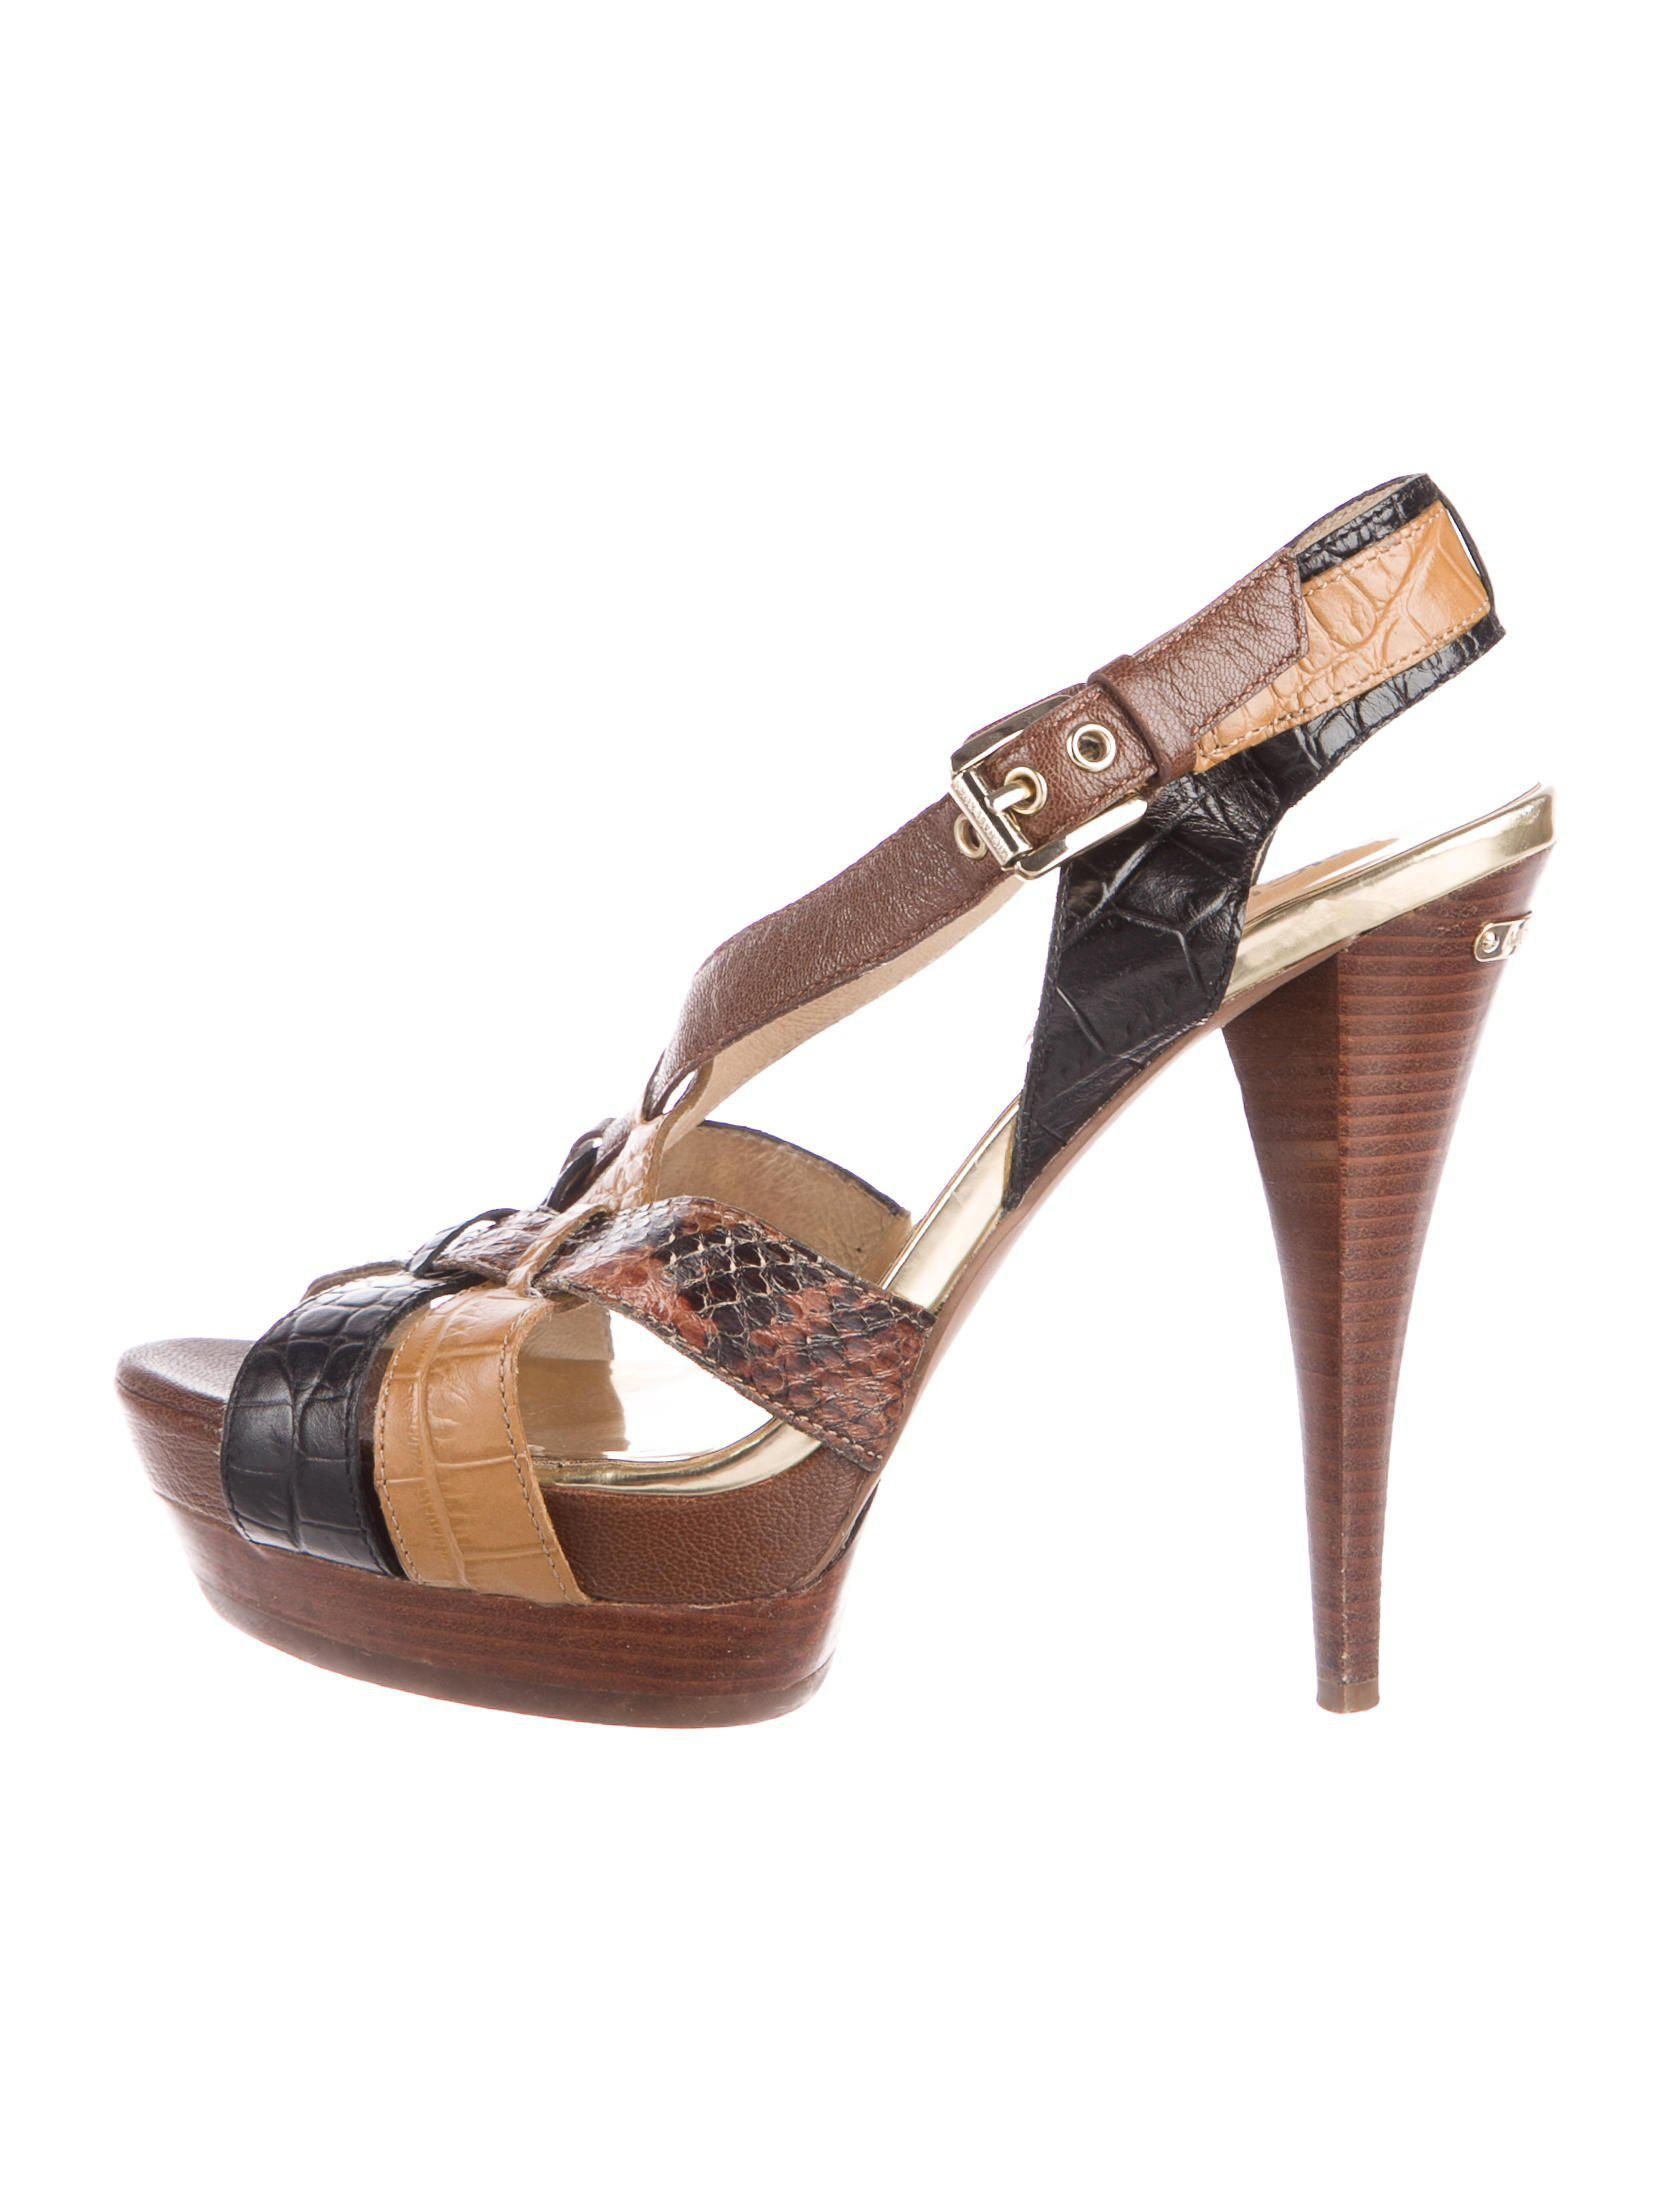 aa41905d0c Lyst - Michael Kors Snakeskni-trimmed Platform Sandals in Brown